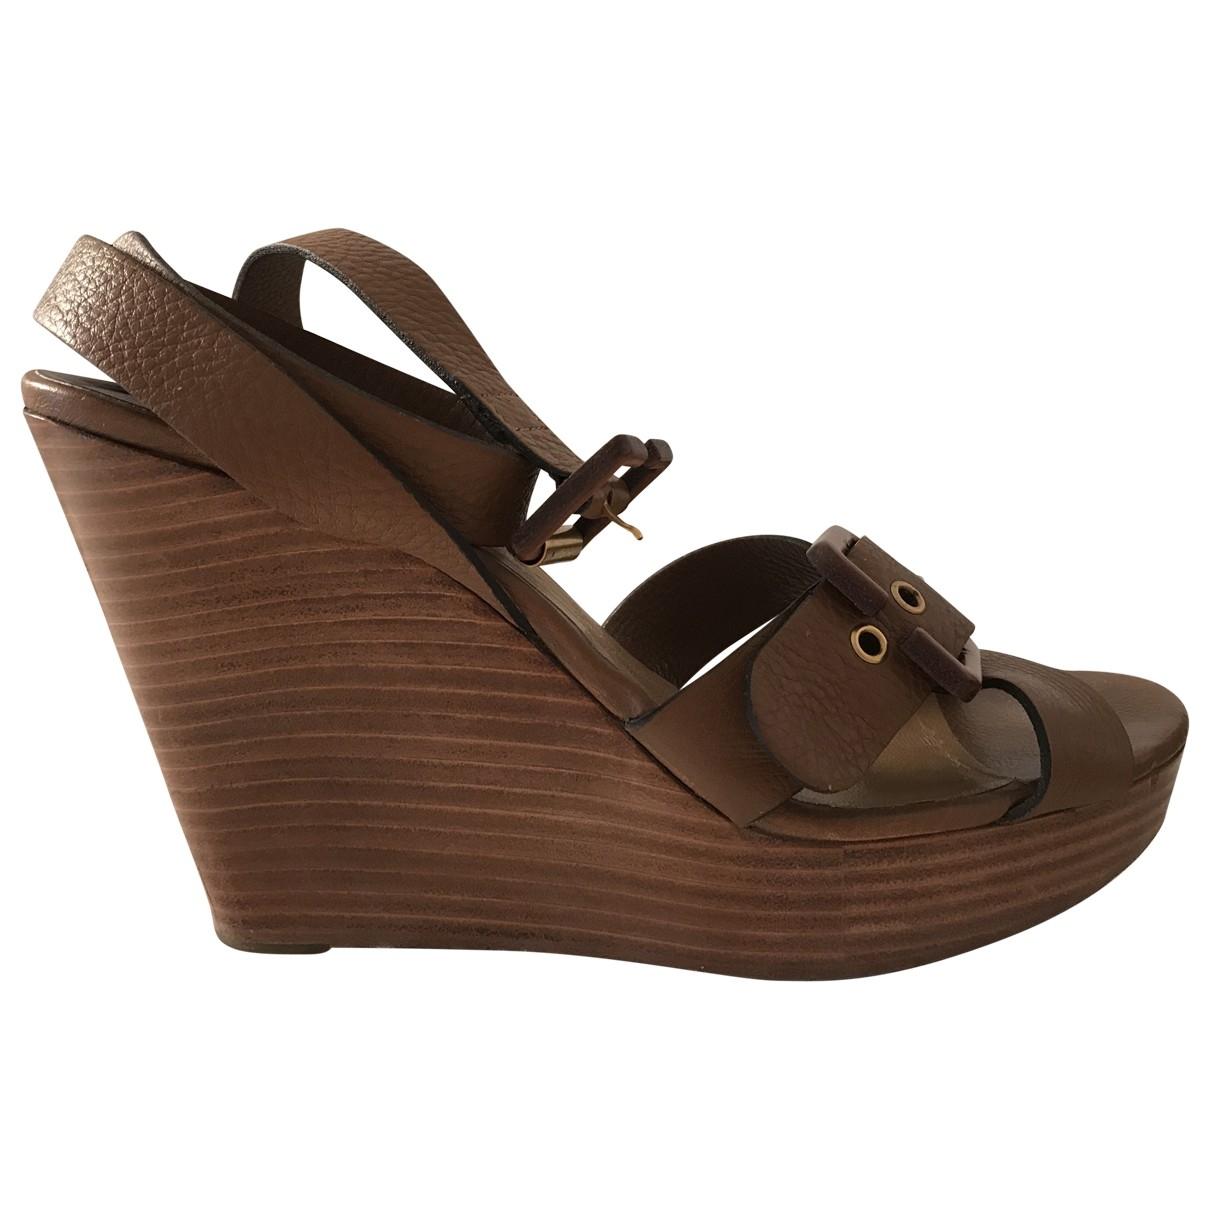 Chloé \N Beige Leather Sandals for Women 40 EU